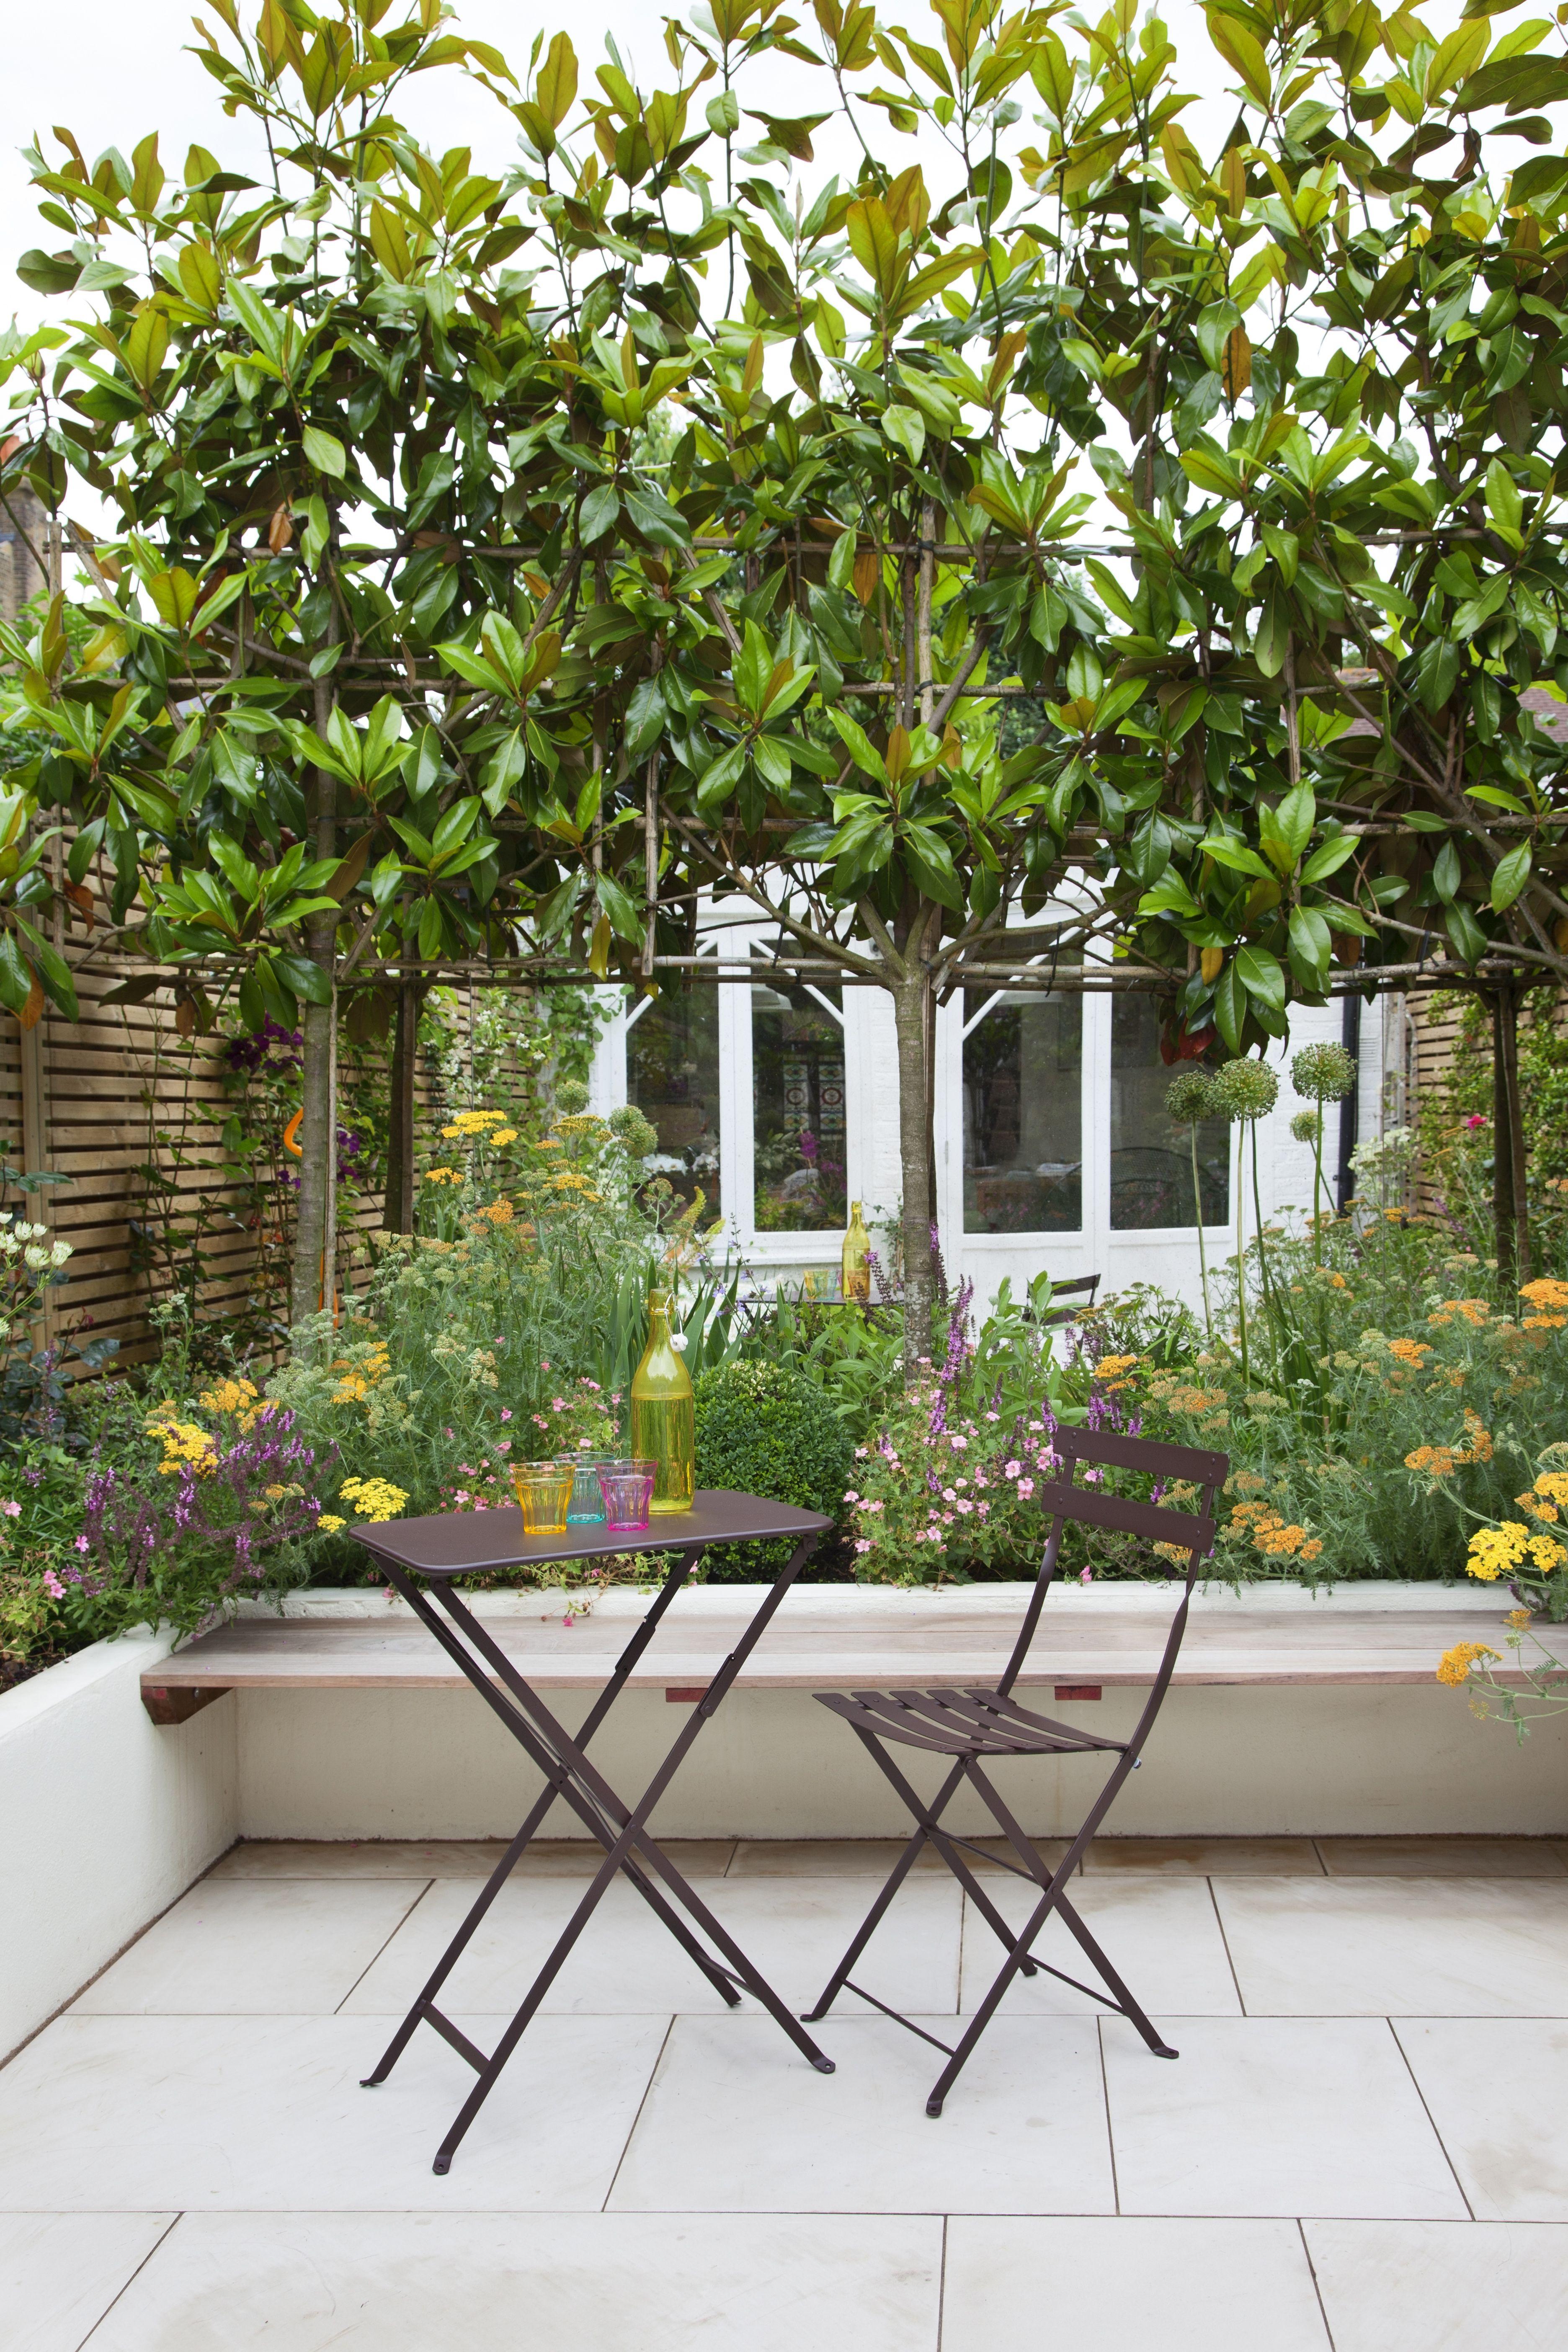 A London Courtyard Garden Designed By Joanna Archer Pleached Magnolia Trees Soft Perennial Plantin Garden Design Small Courtyard Gardens Garden Design London